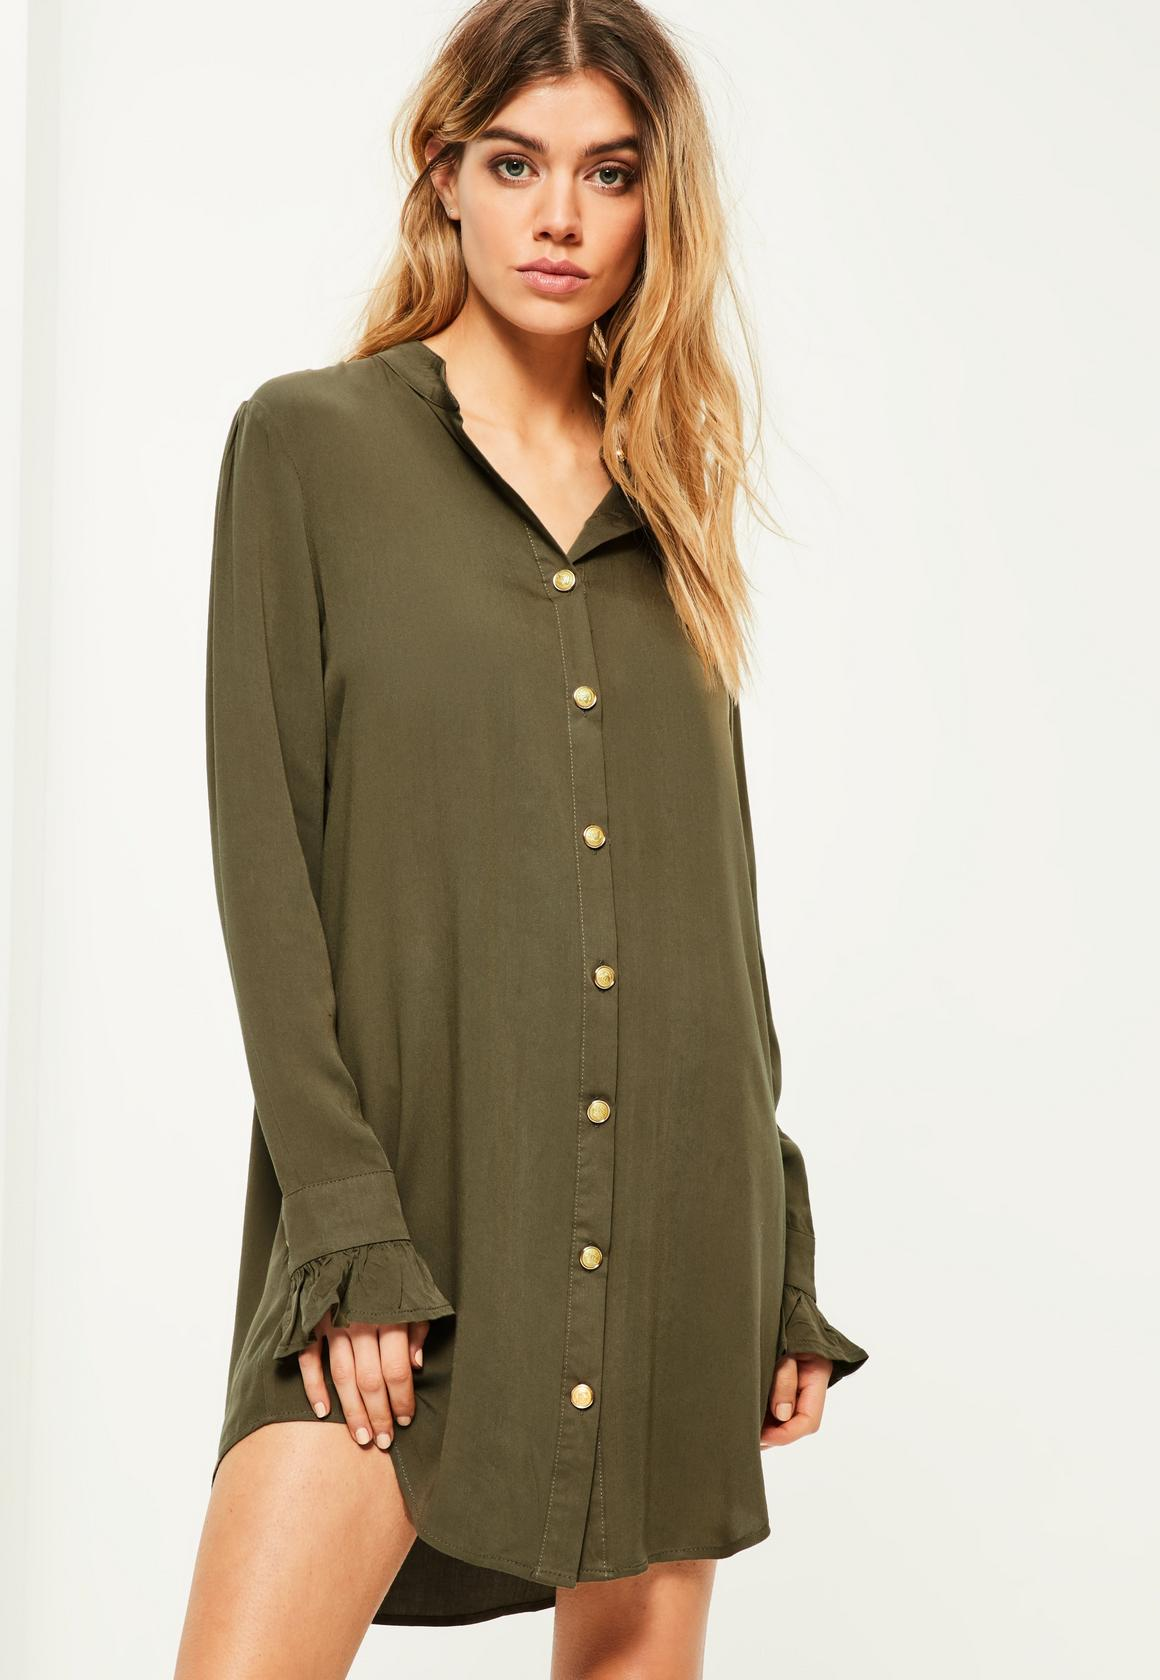 Long Sleeve Flowy Shirt Dress Joe Maloy